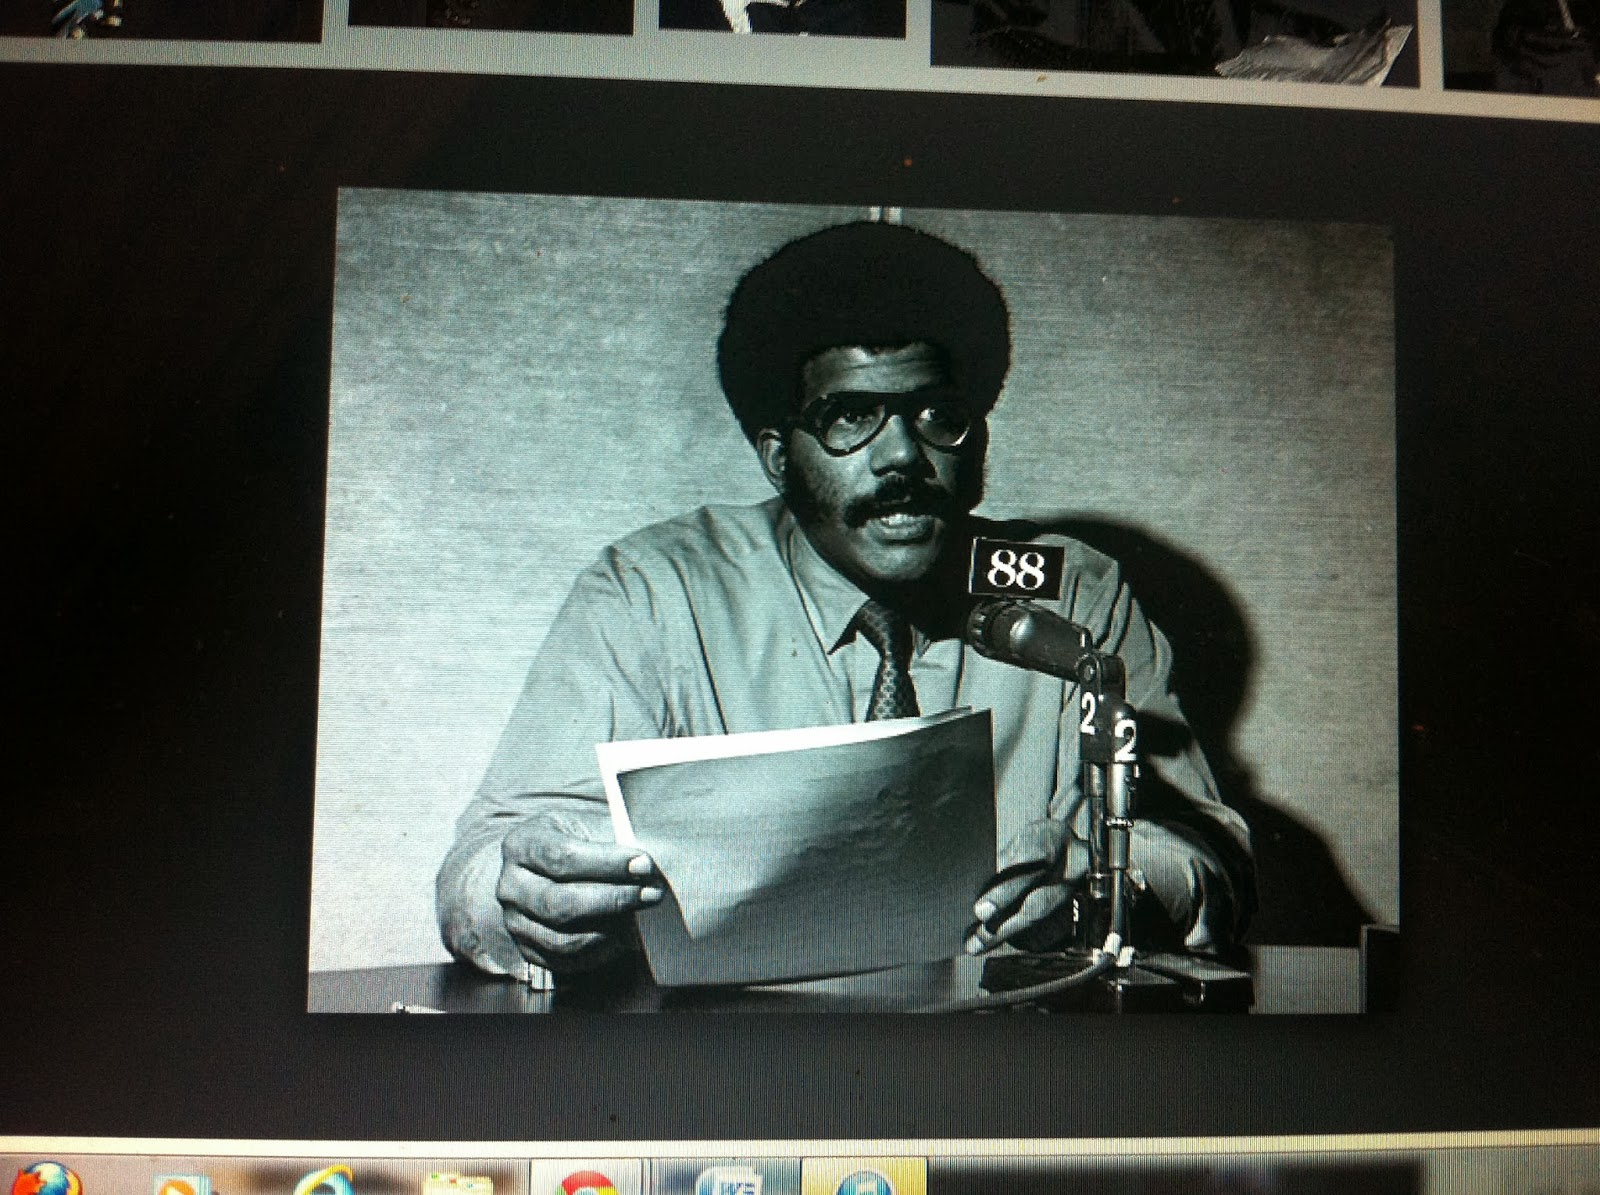 The Black Social History Black Social History African Jpg 1600x1195 African American Black 60 Minutes Anchor